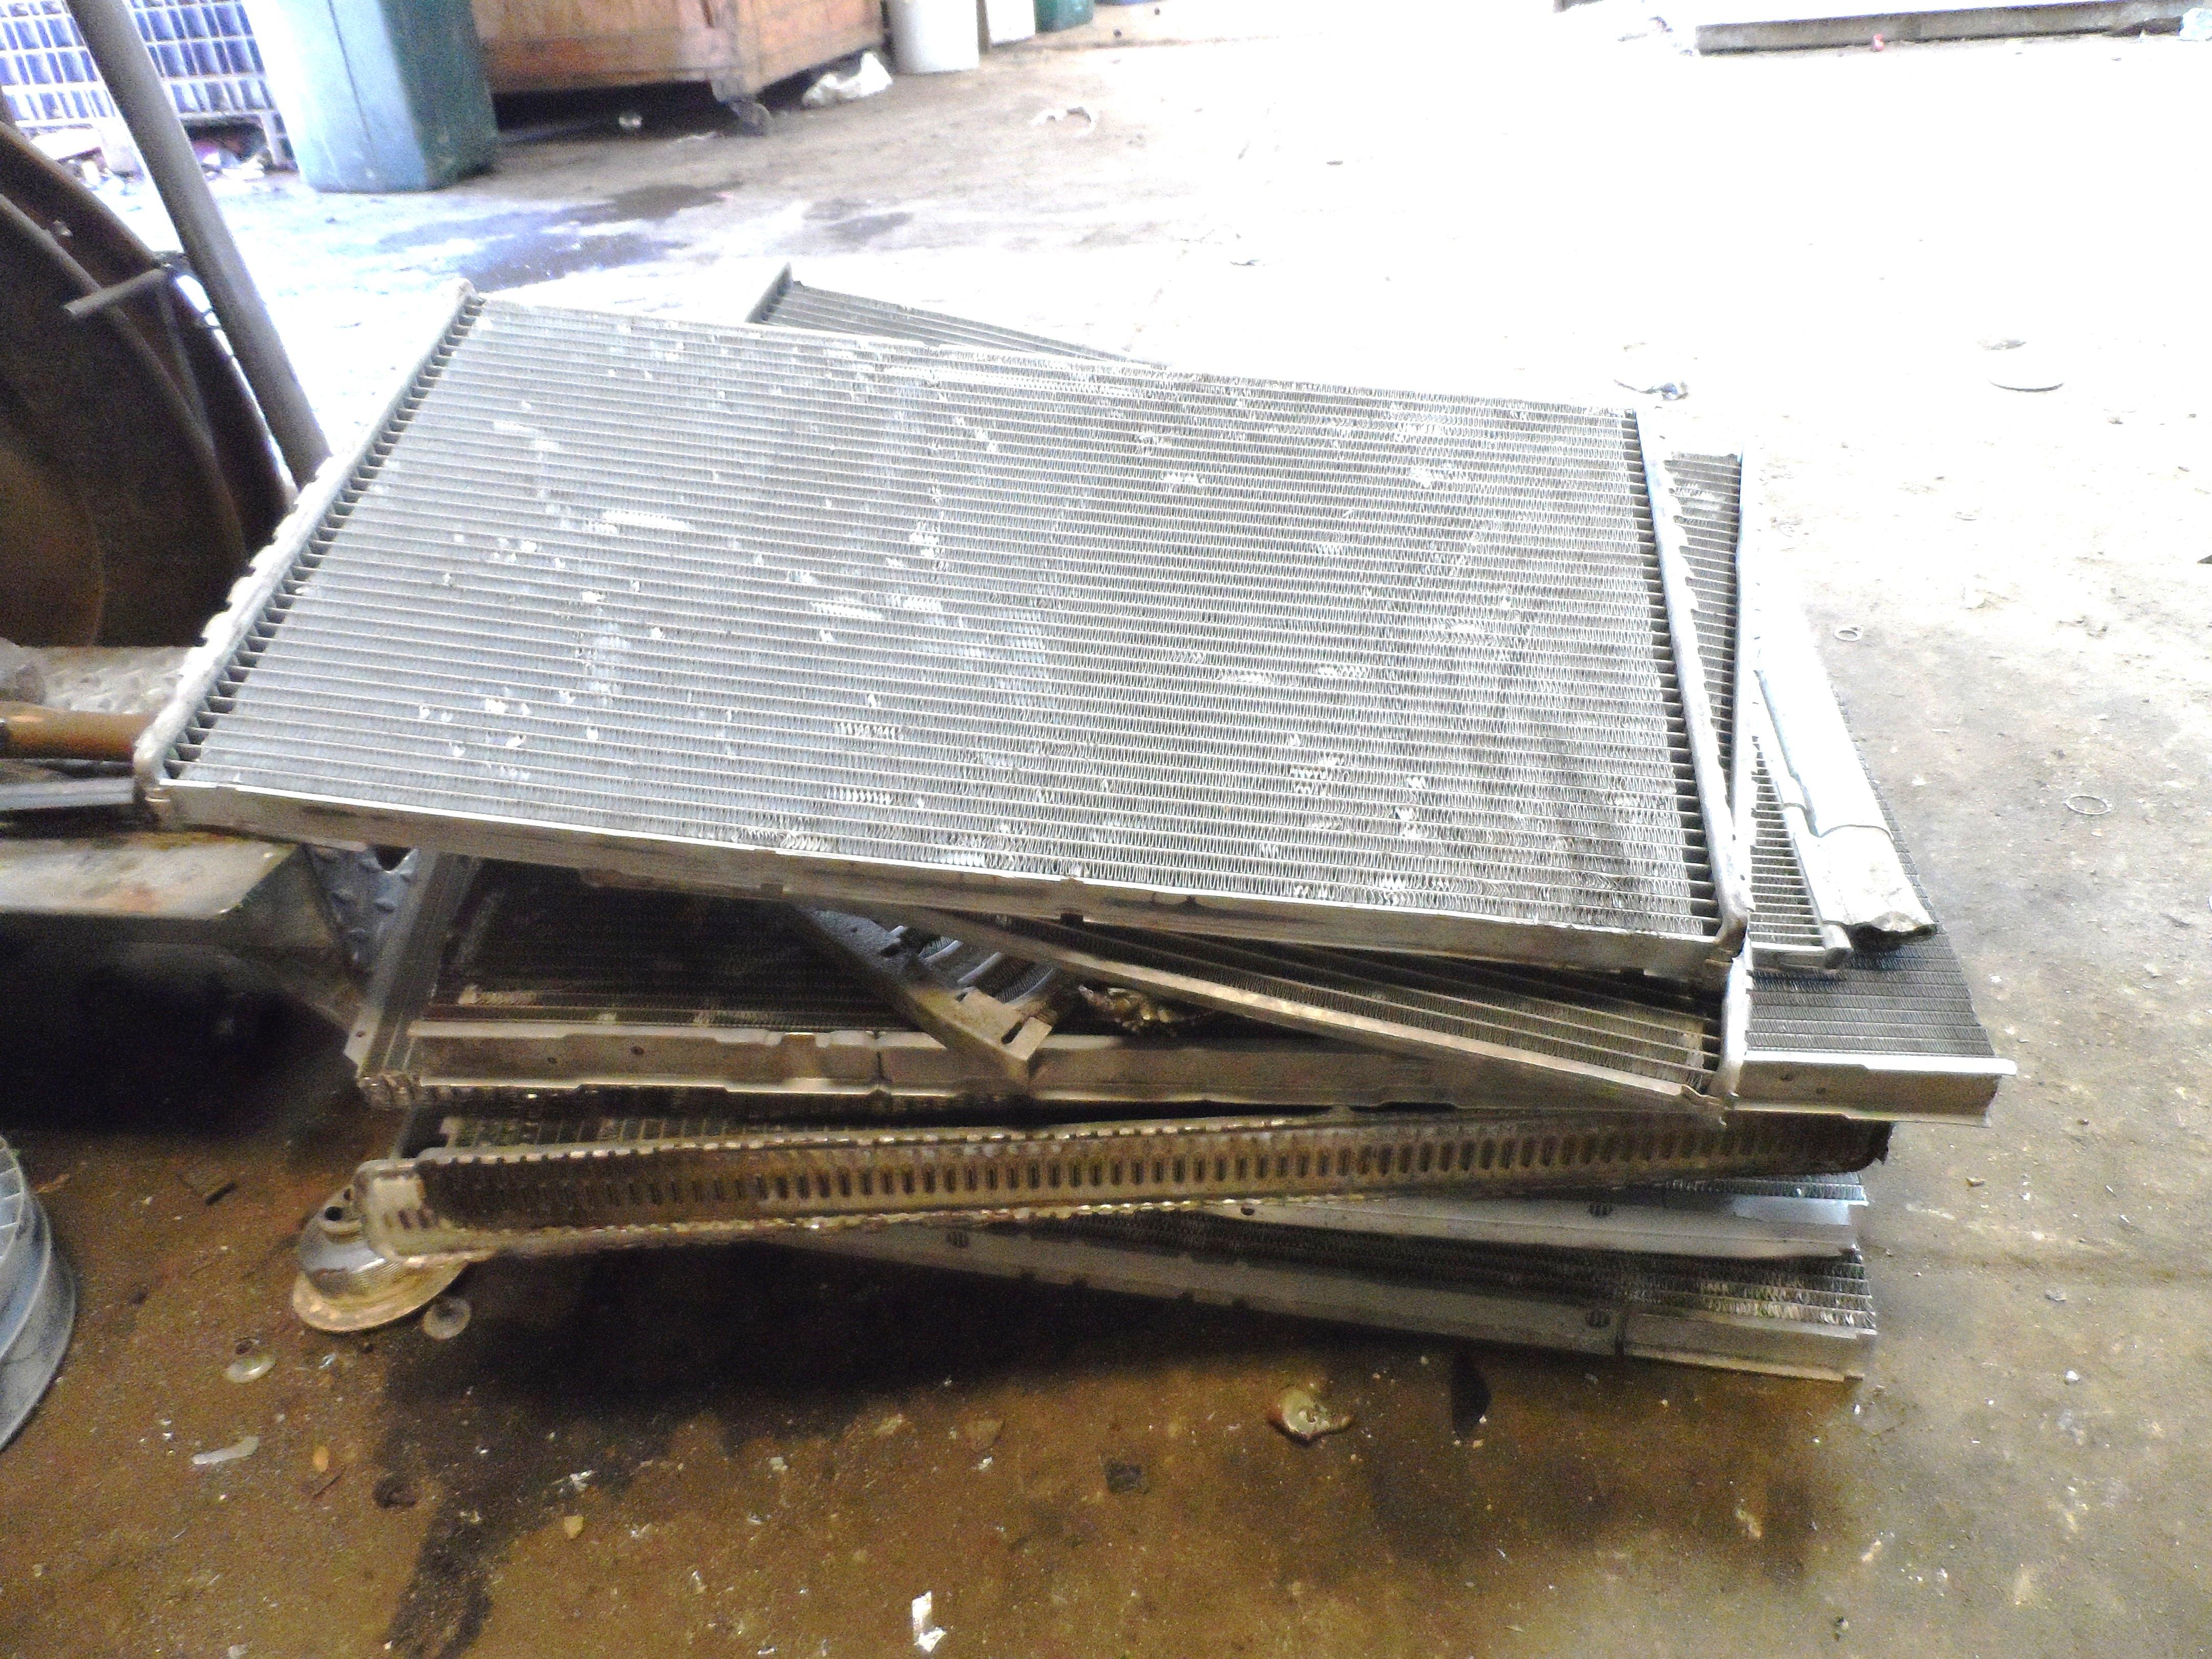 Mack\'s Recycling - Non-ferrous Scrap Metal